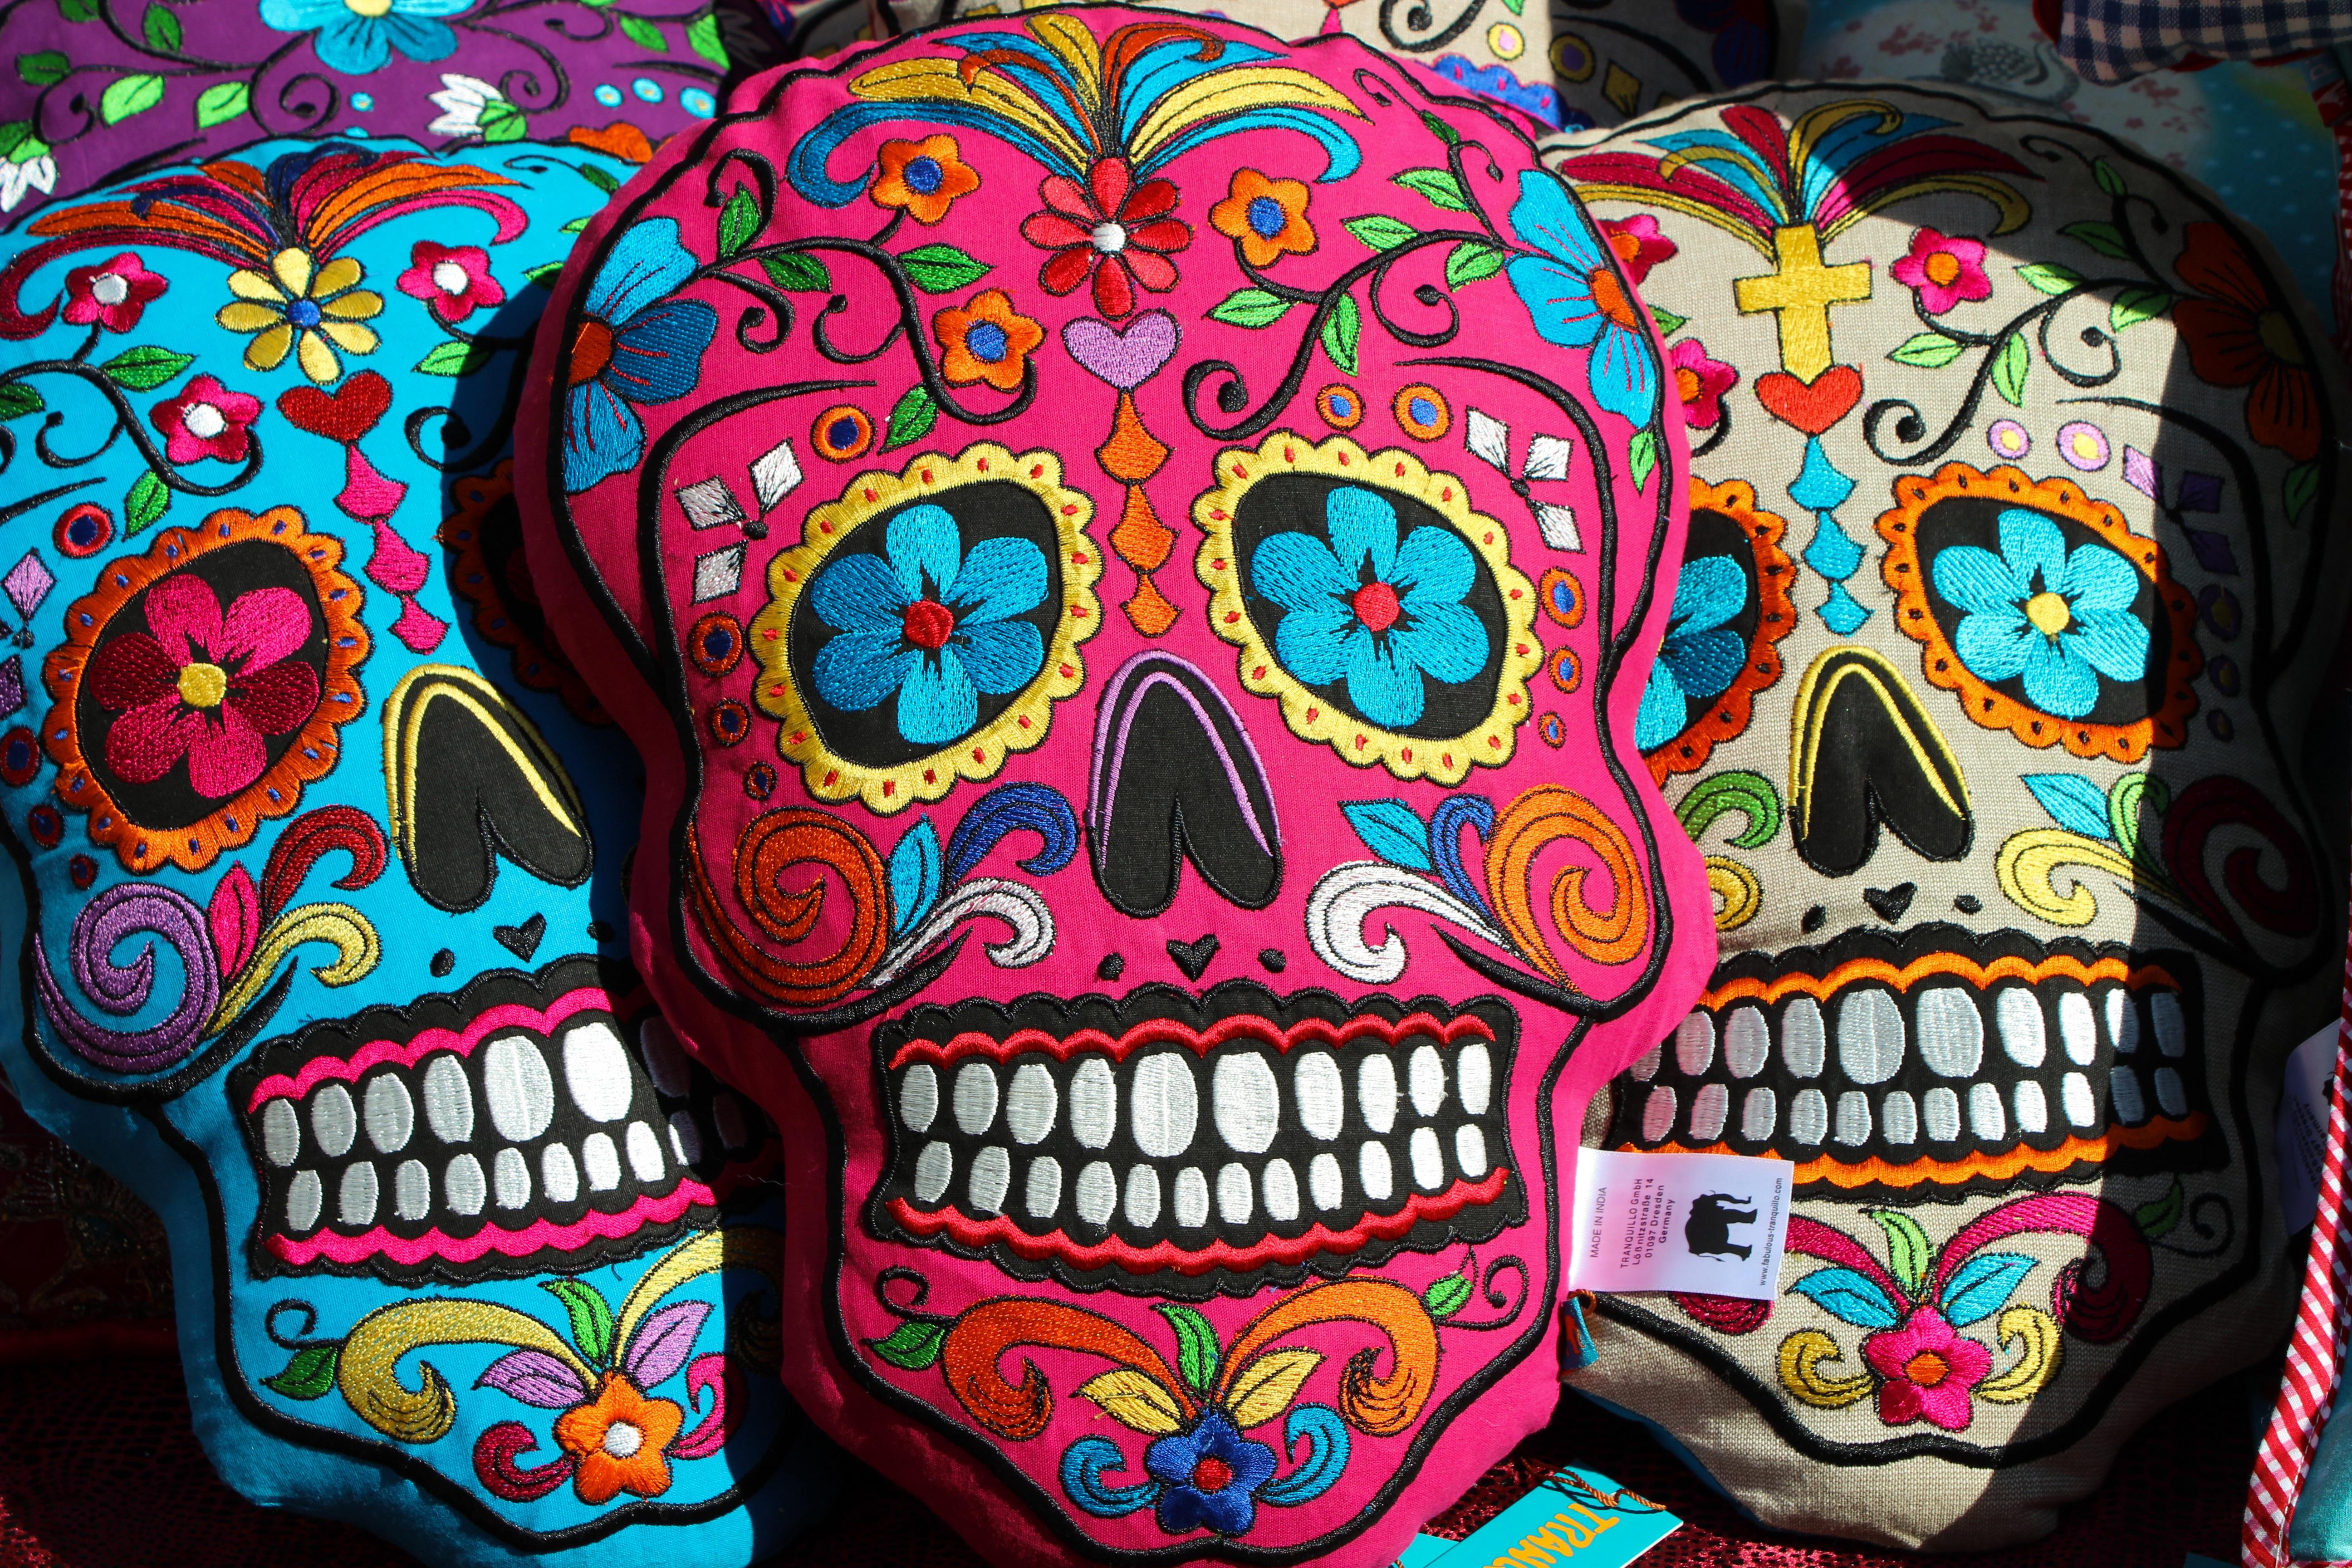 free images decoration red symbol skull bone face